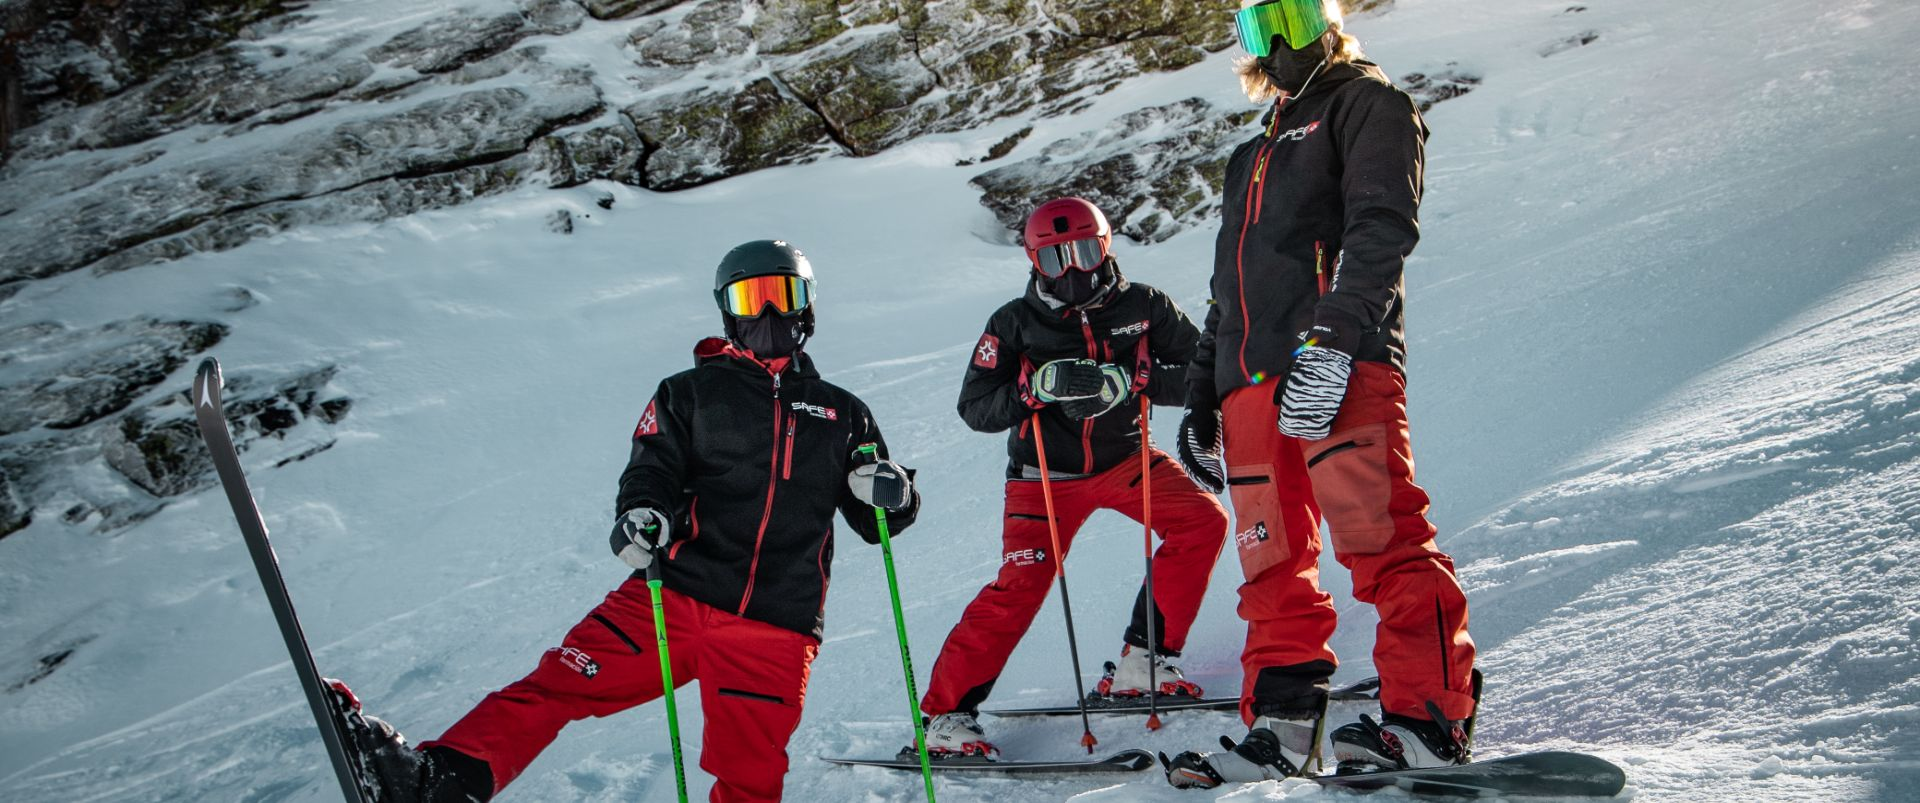 prueba-acceso-esqui-alpino-snowboard-valdesqui-safe-formacion-dic21-slide